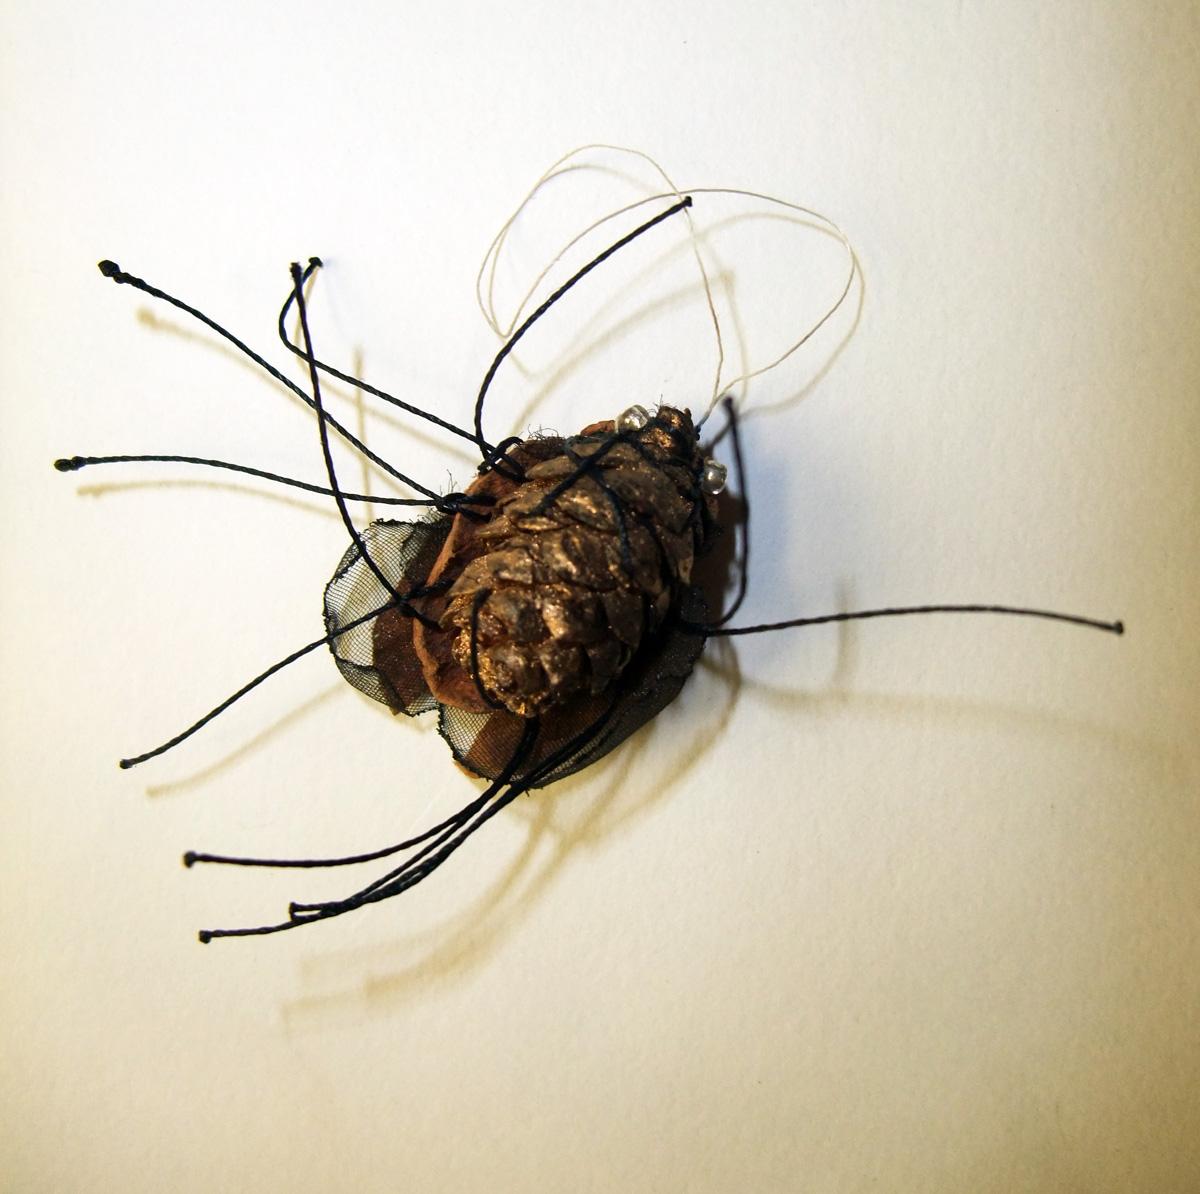 Australian Christmas Beetle.Irene Manion S Magical Australian Christmas Beetle Talisman